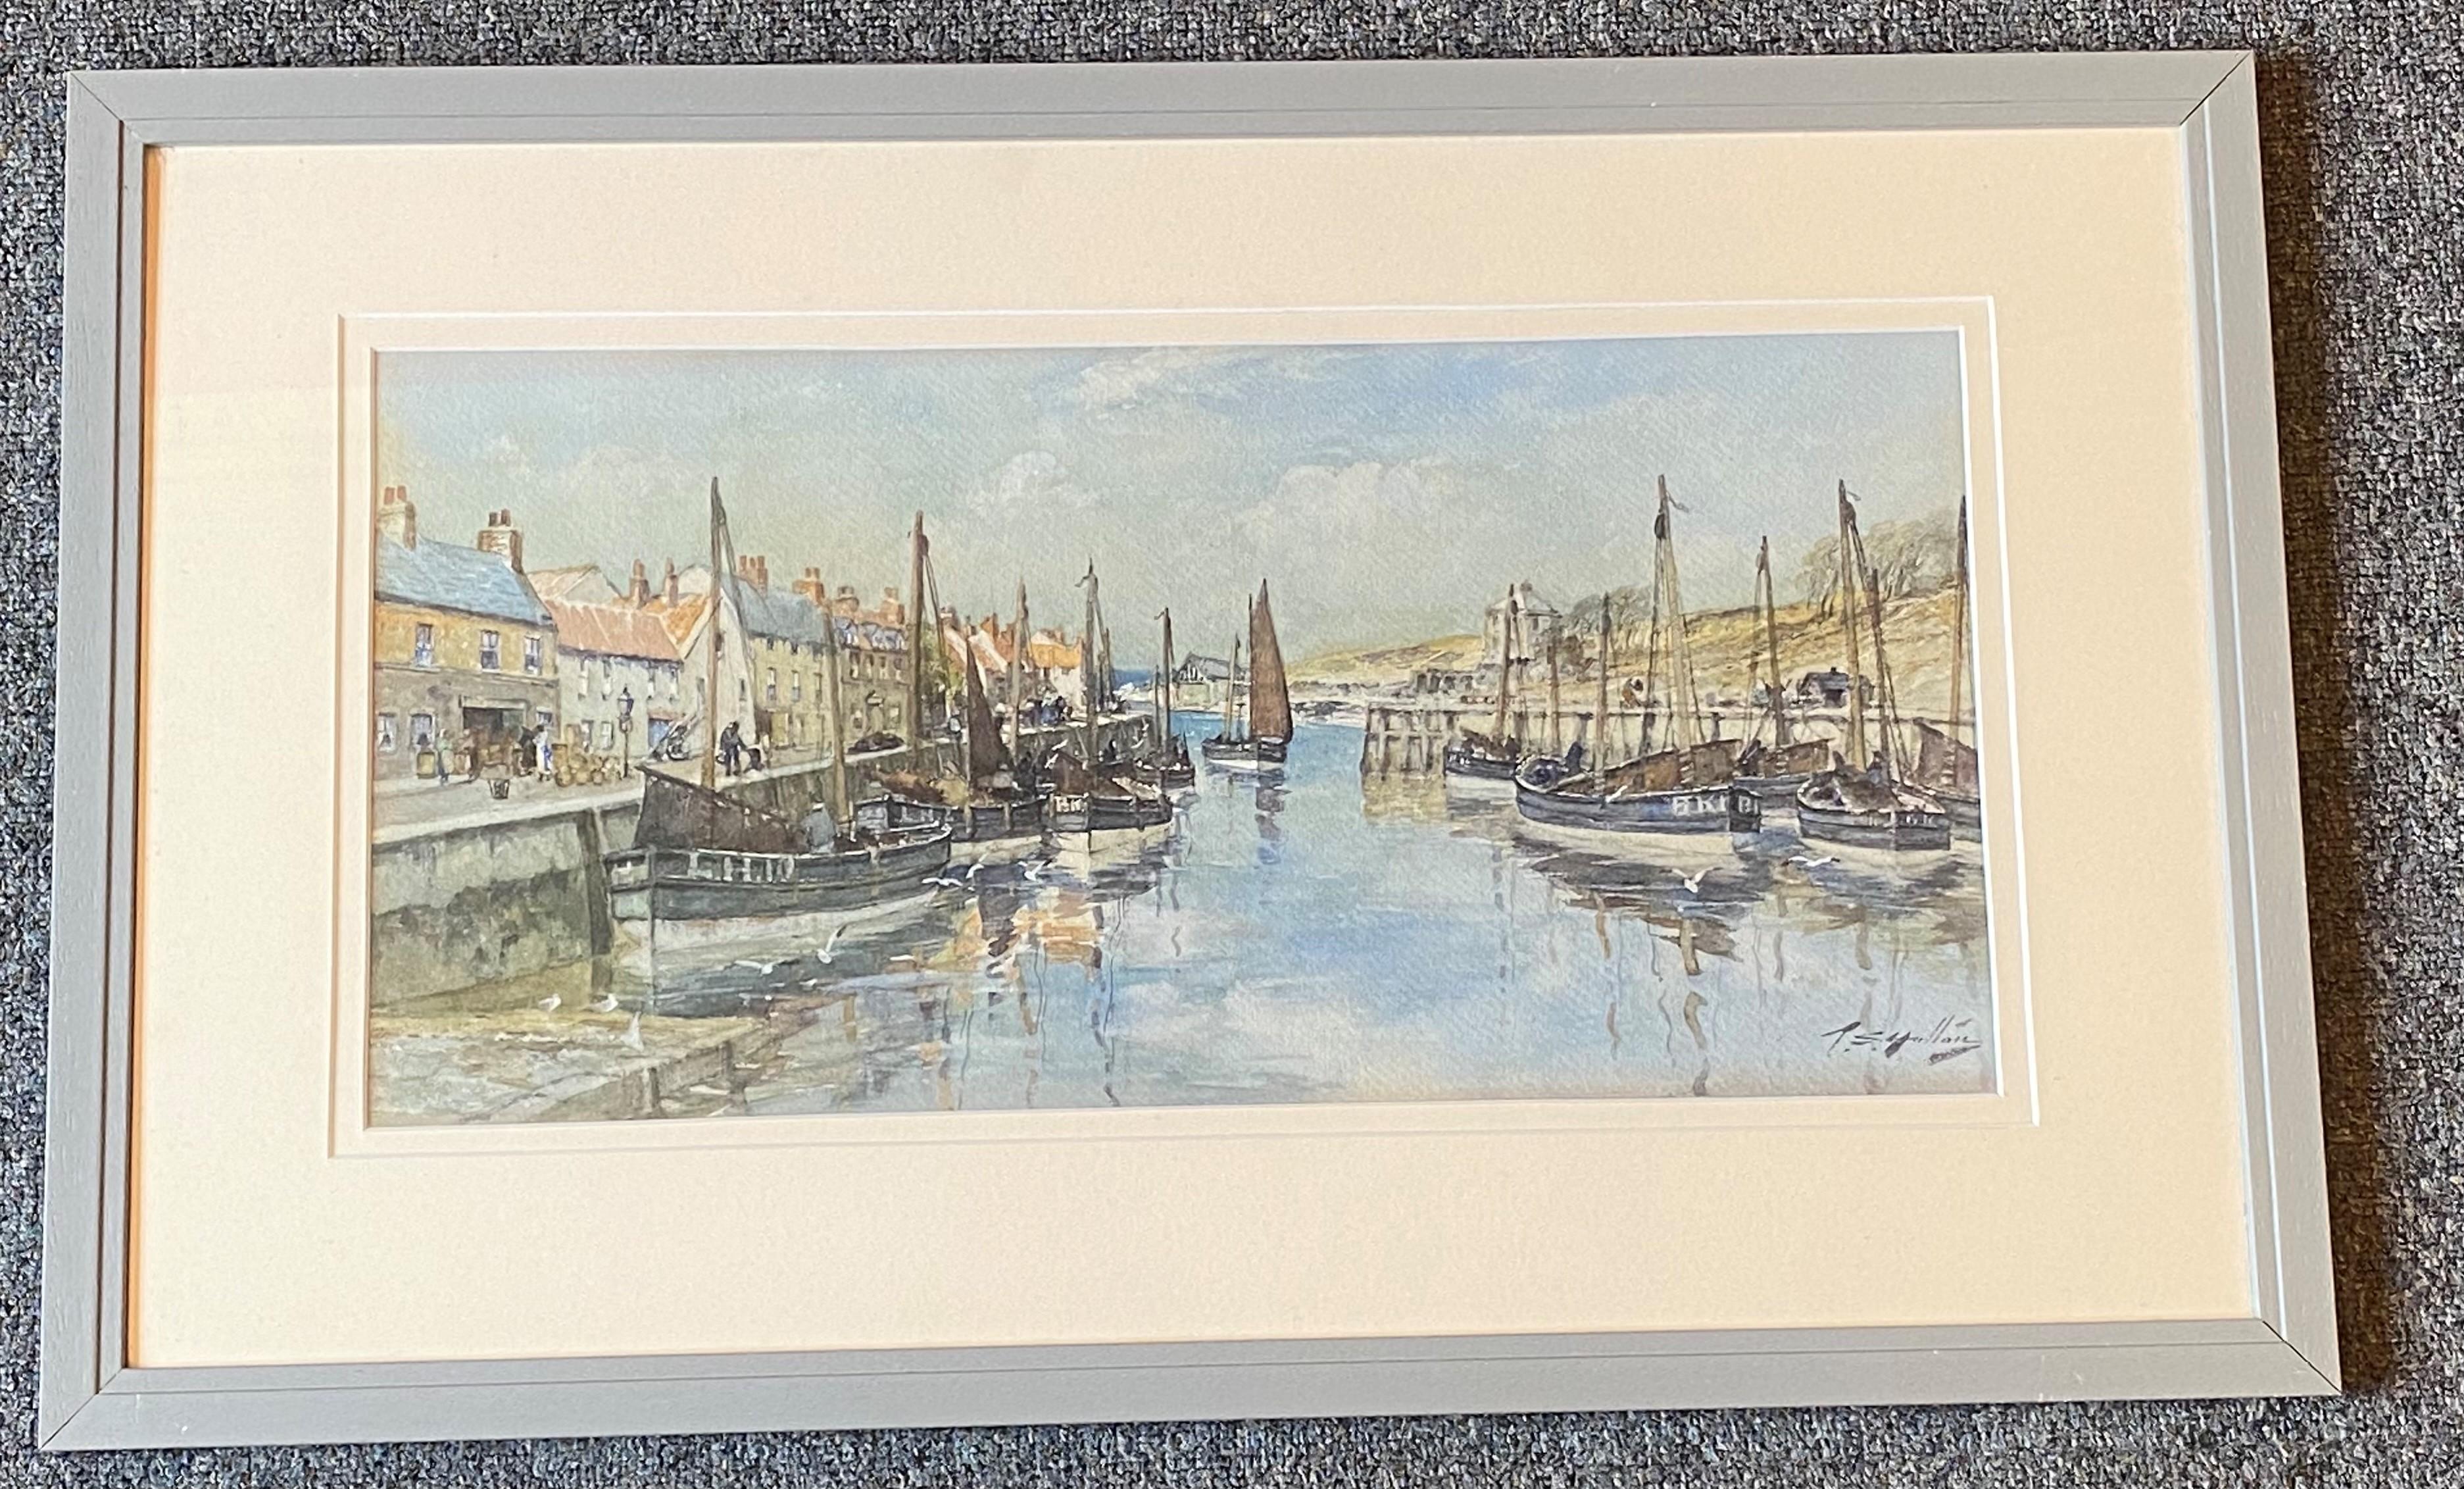 Thomas Swift Hutton 1860-1935 (Scottish) signed watercolour Eyemouth harbour